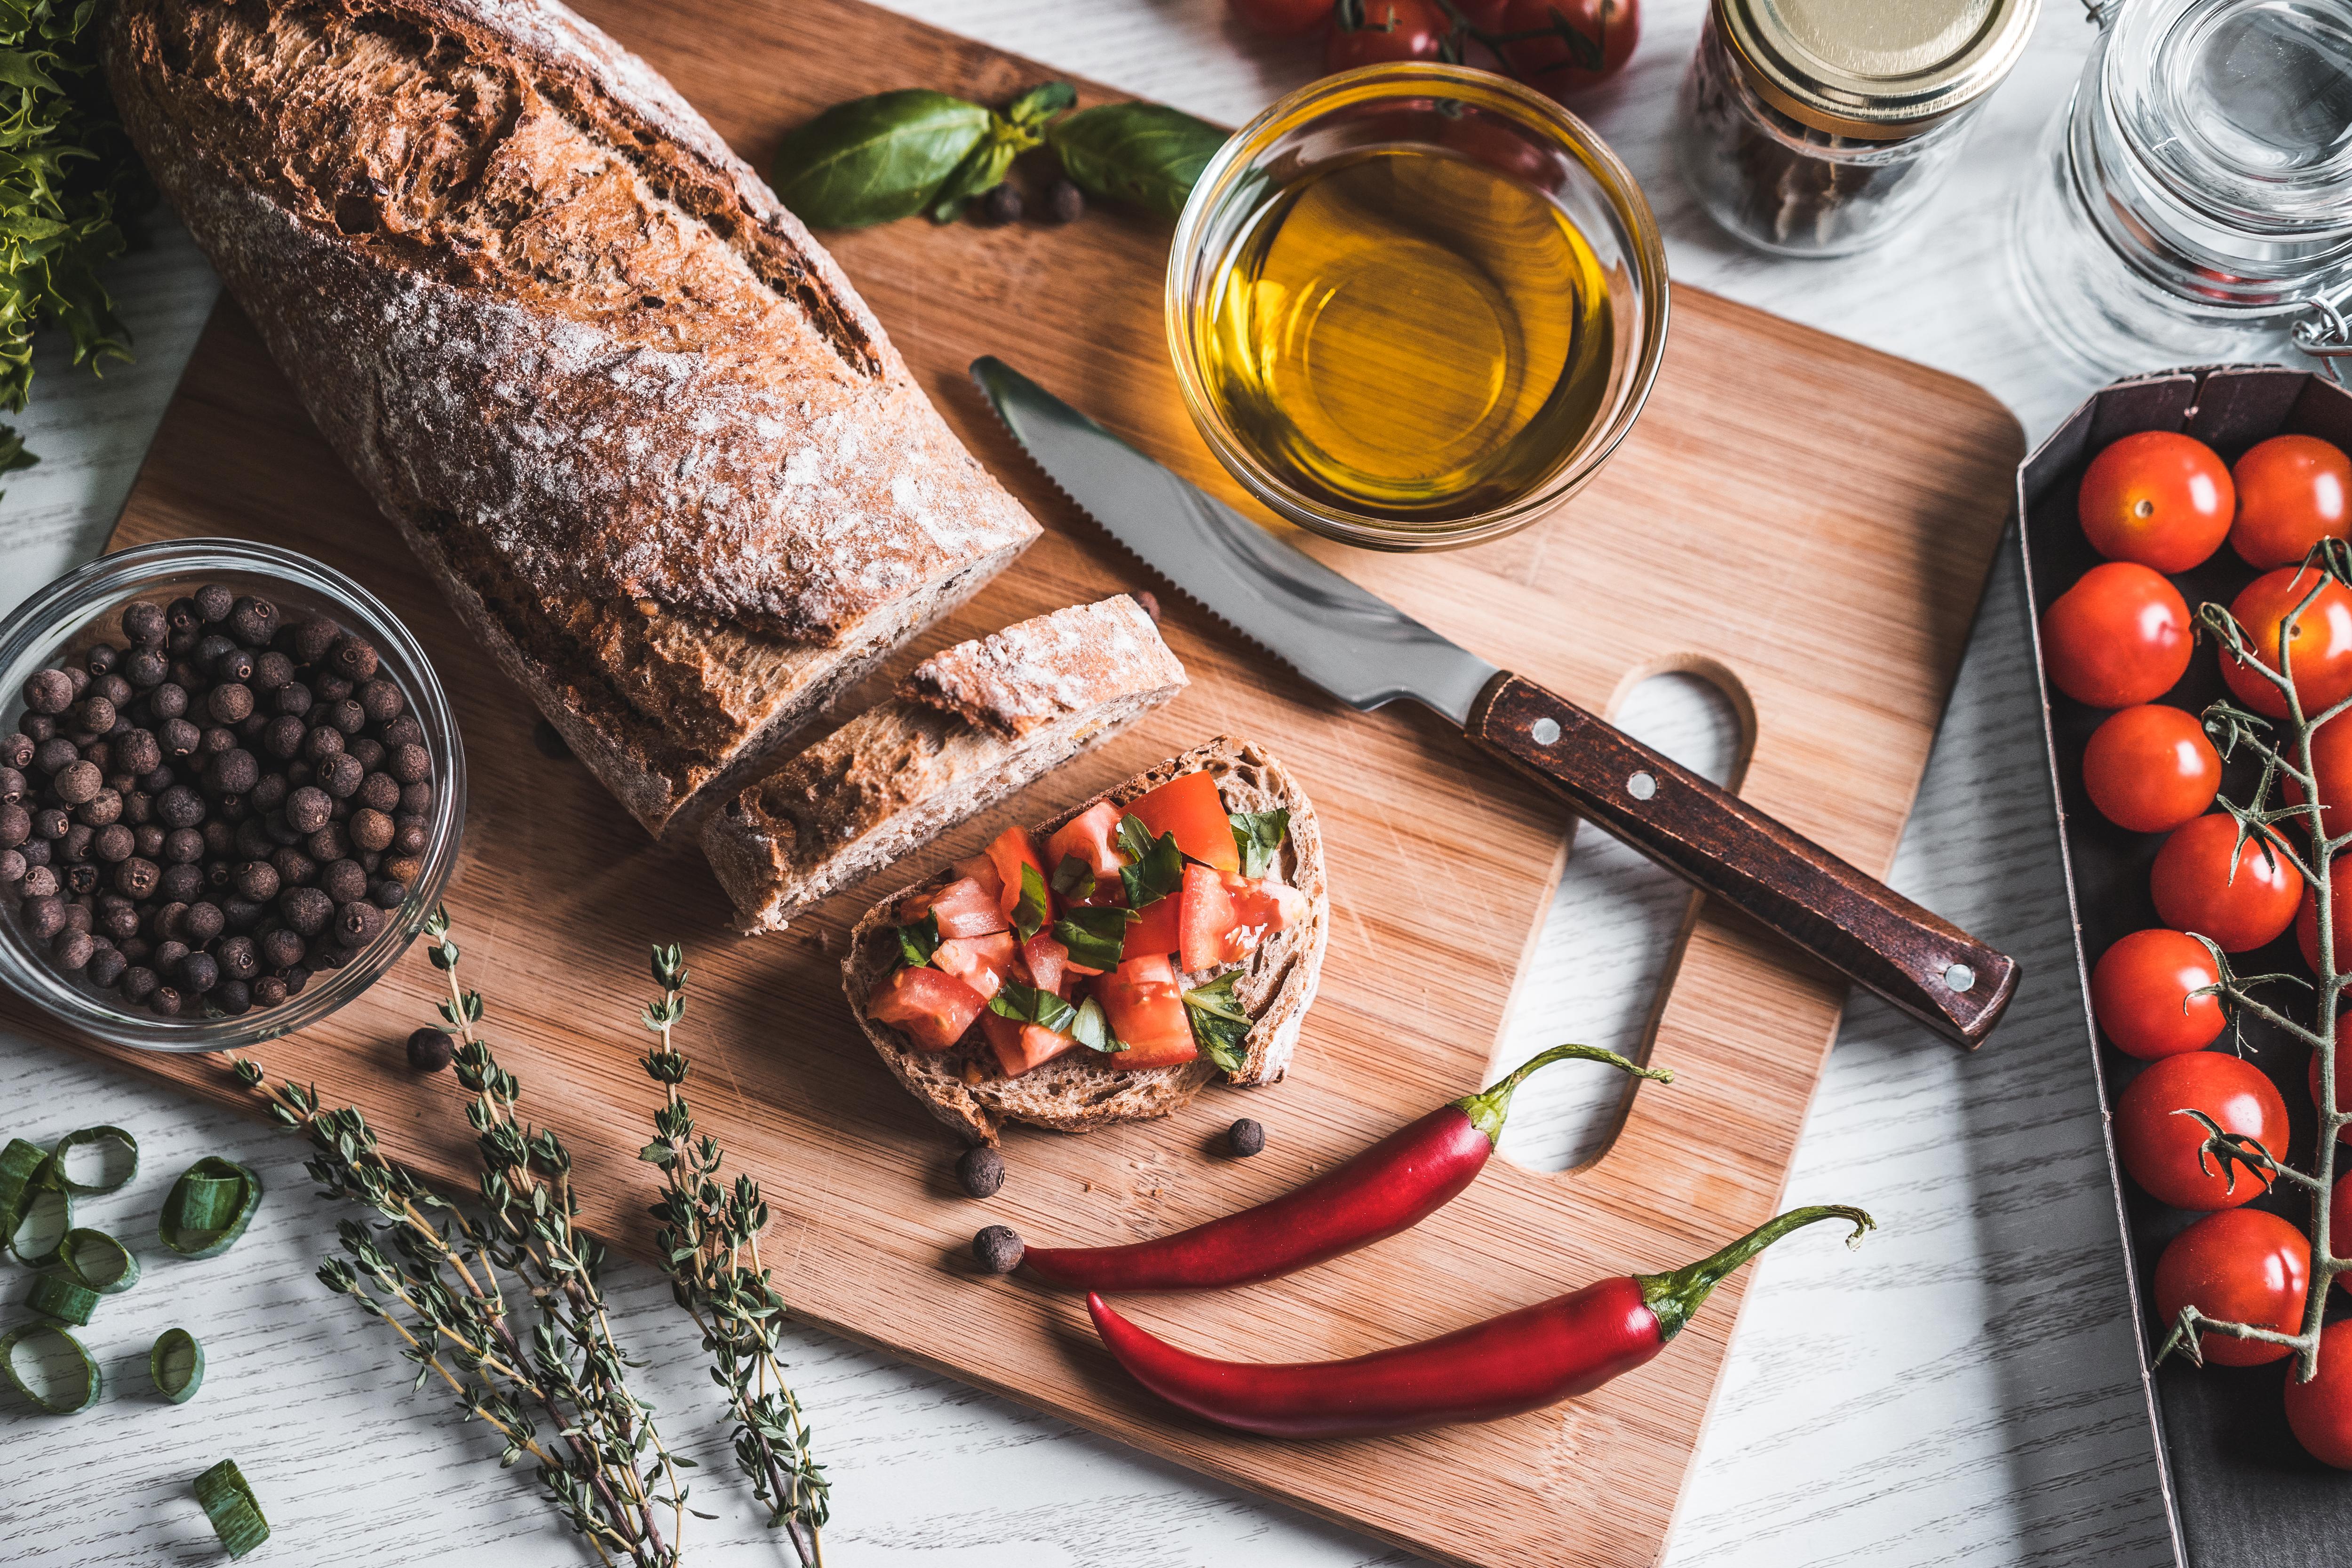 watkins food recipes